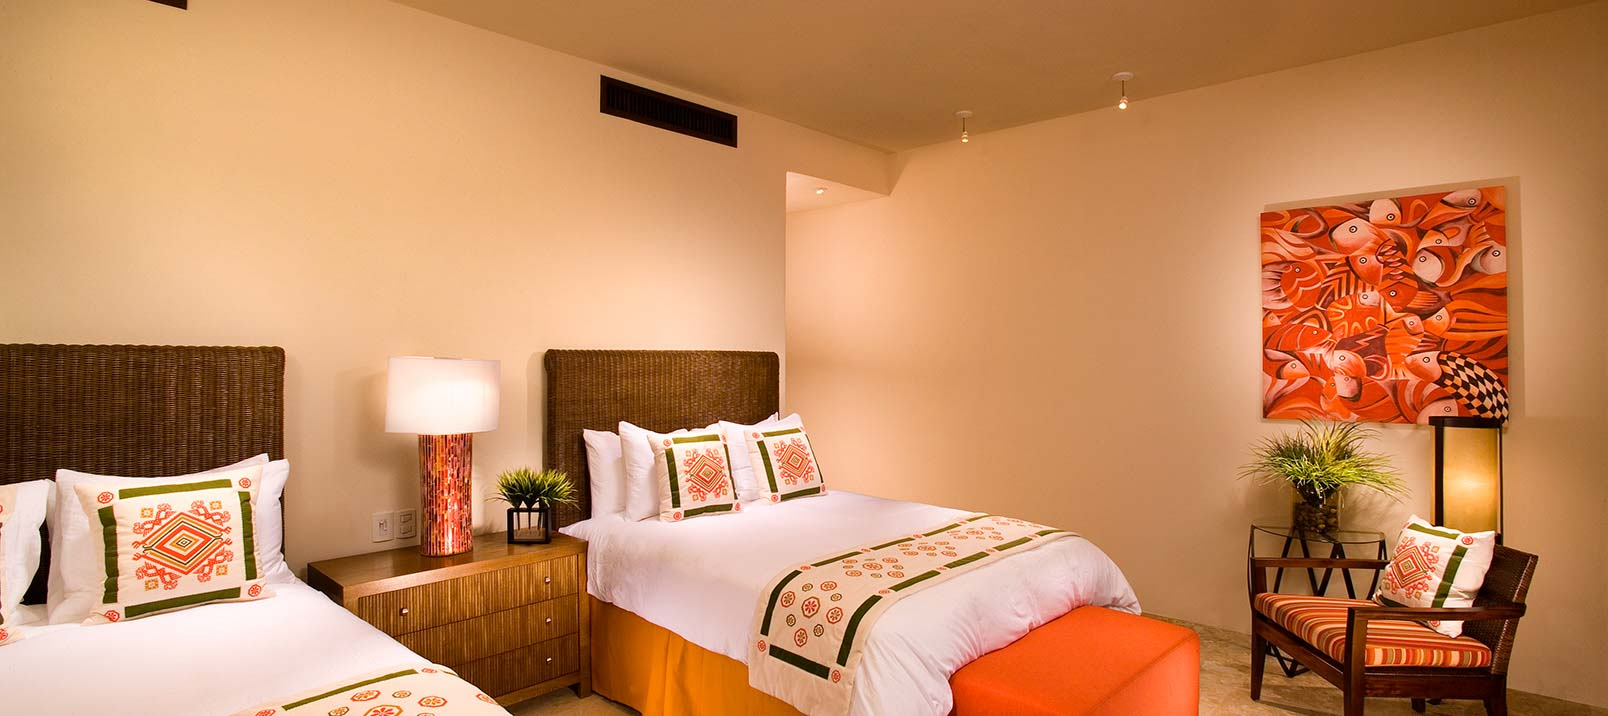 er-residence-header-disp-residence-real-del-mar-casa-del-puente-5.jpg